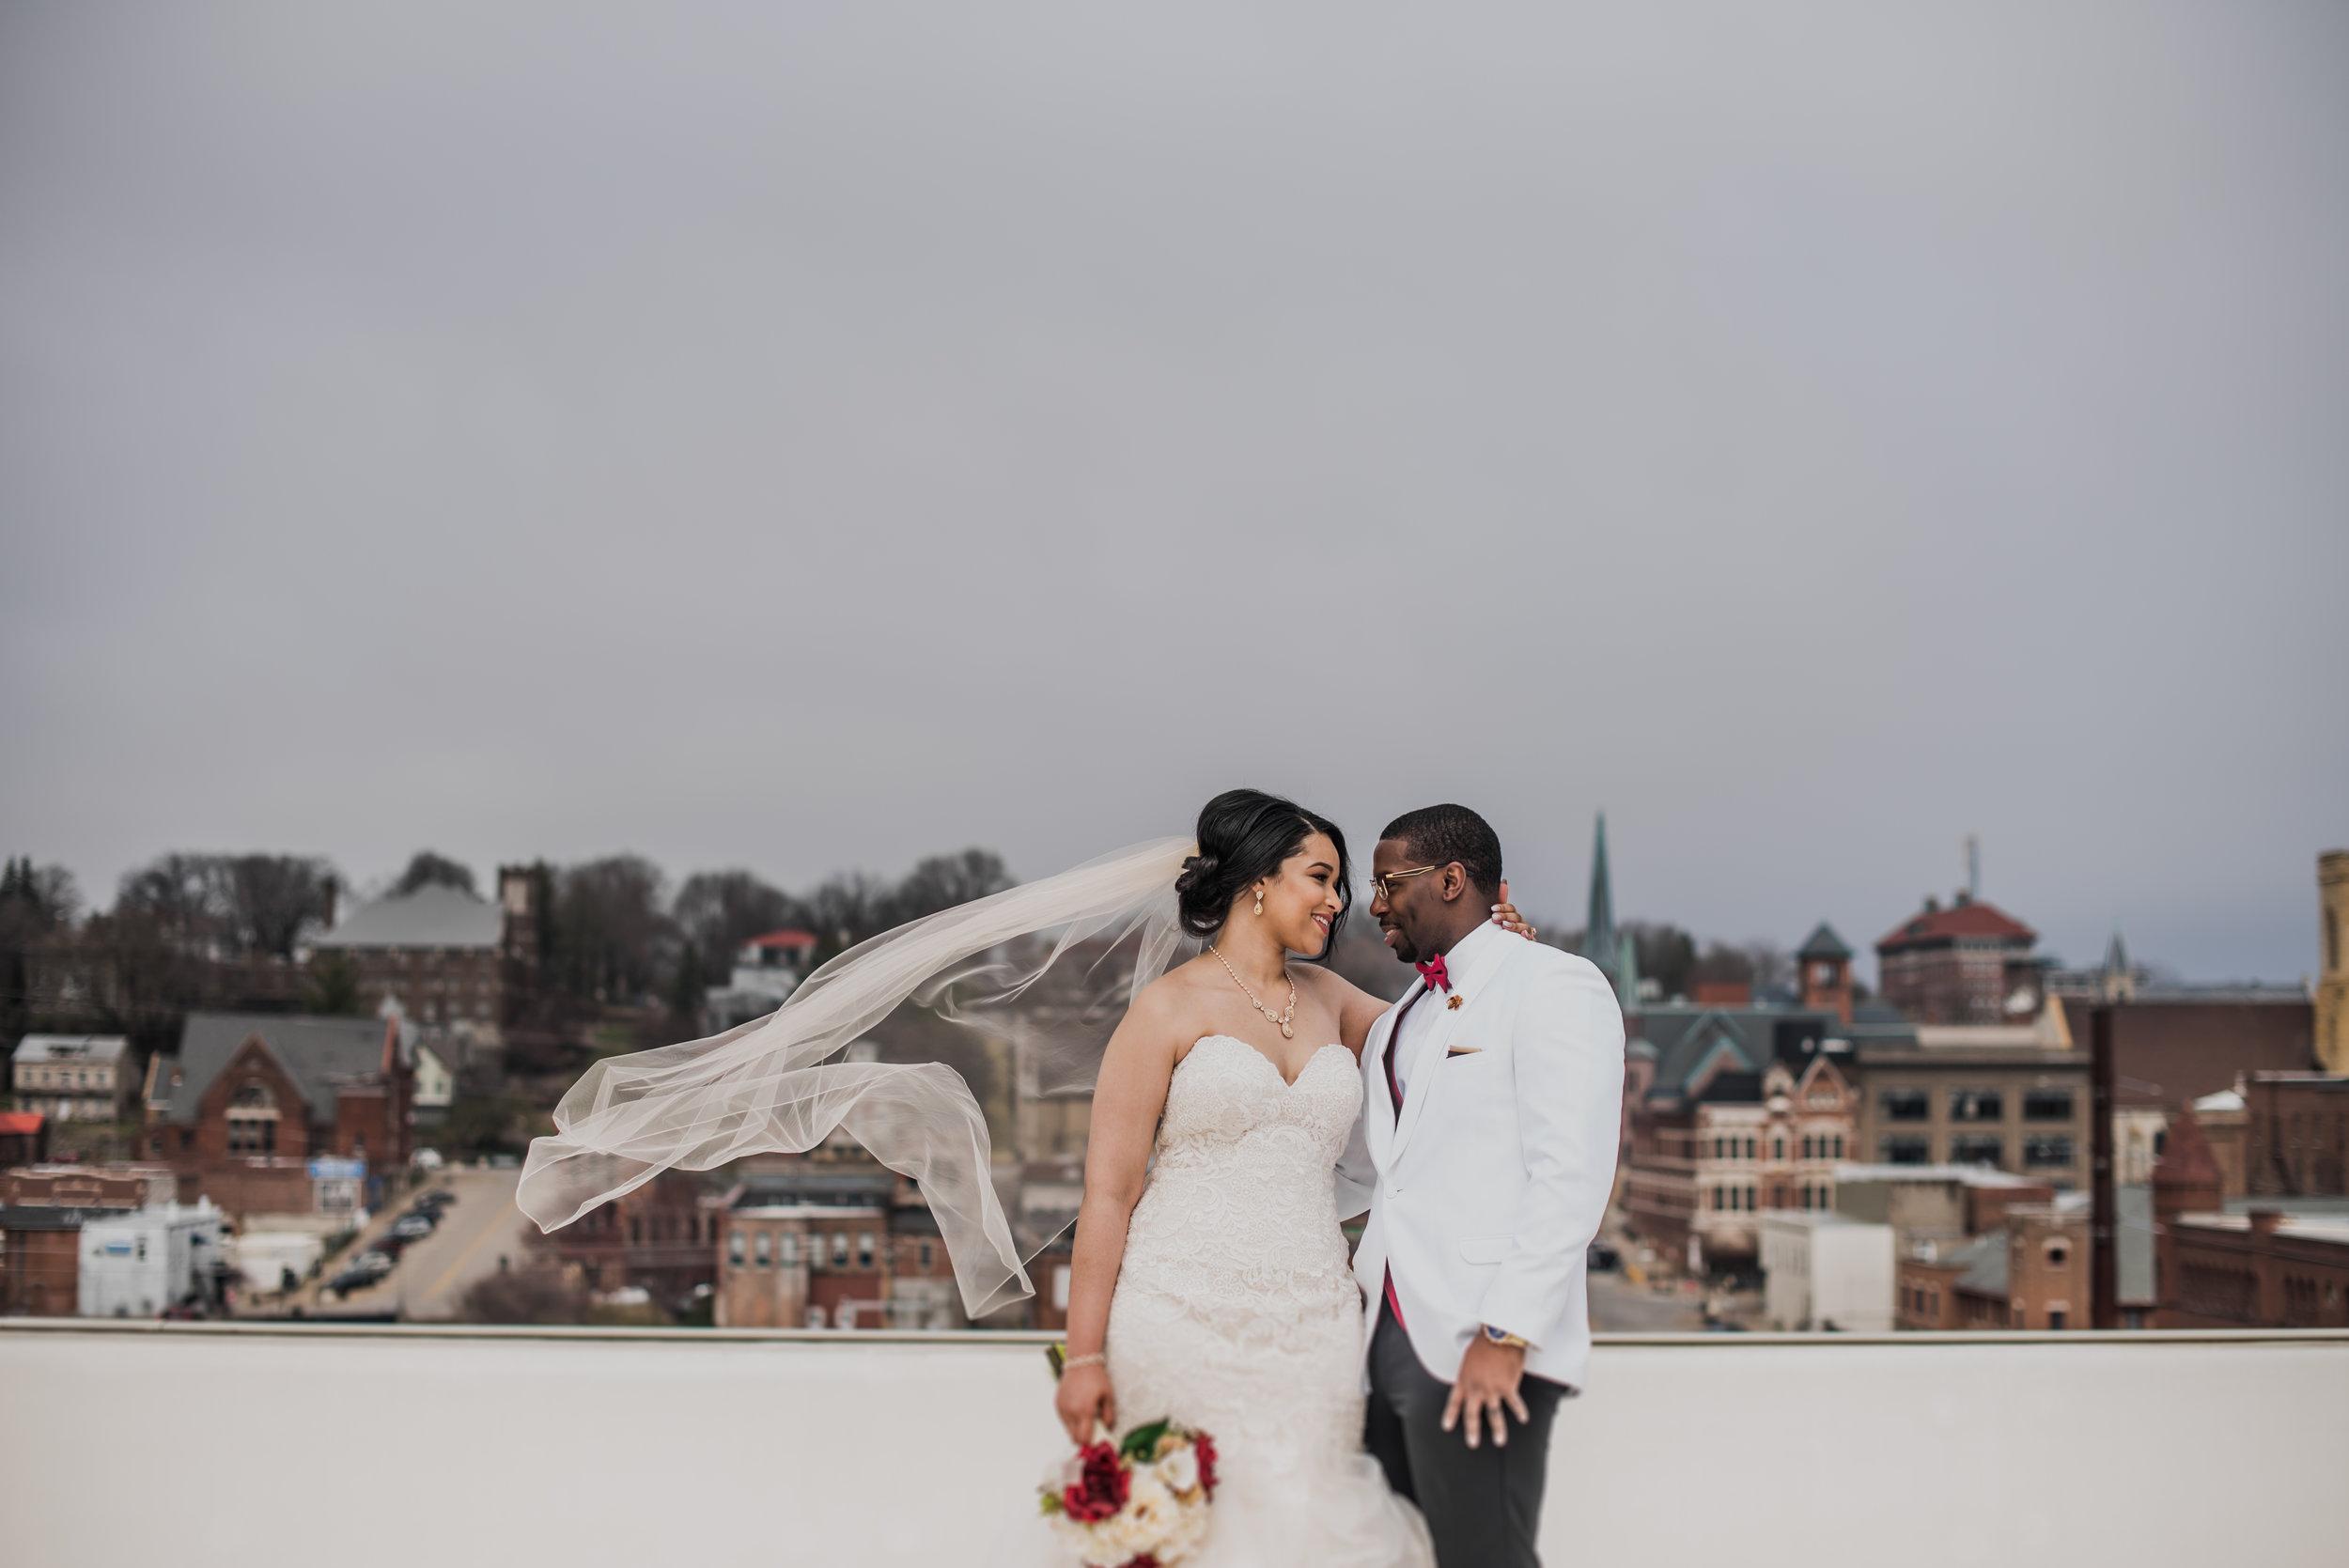 Burlington Iowa Wedding Midwest Photographer Melissa Cervantes _ Chantelle and Isaiah 291ss.jpg